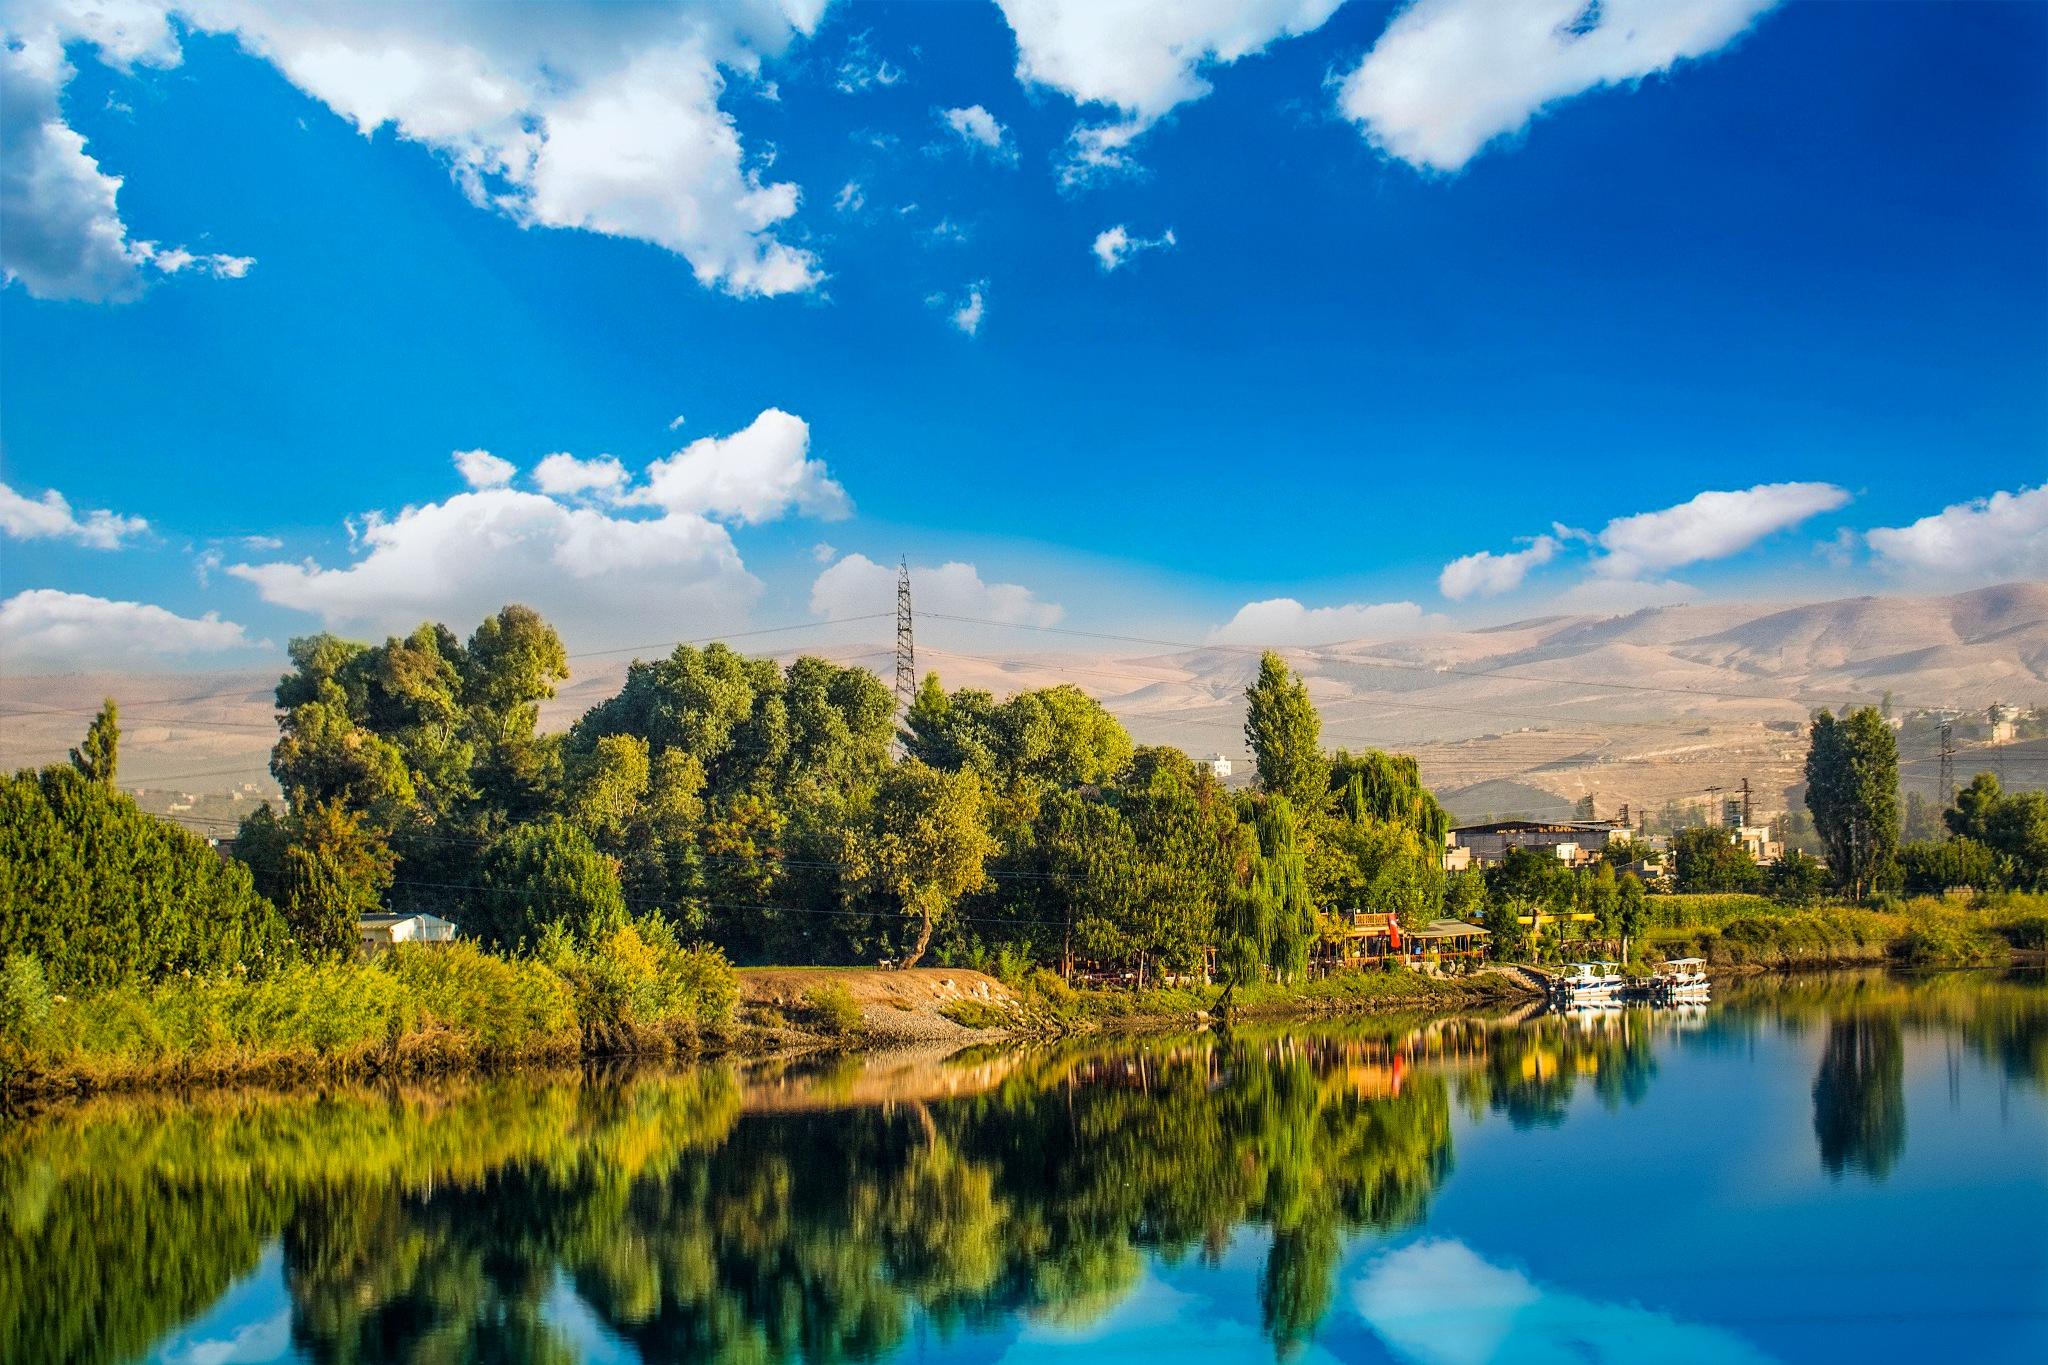 birecik by Halil AKAY